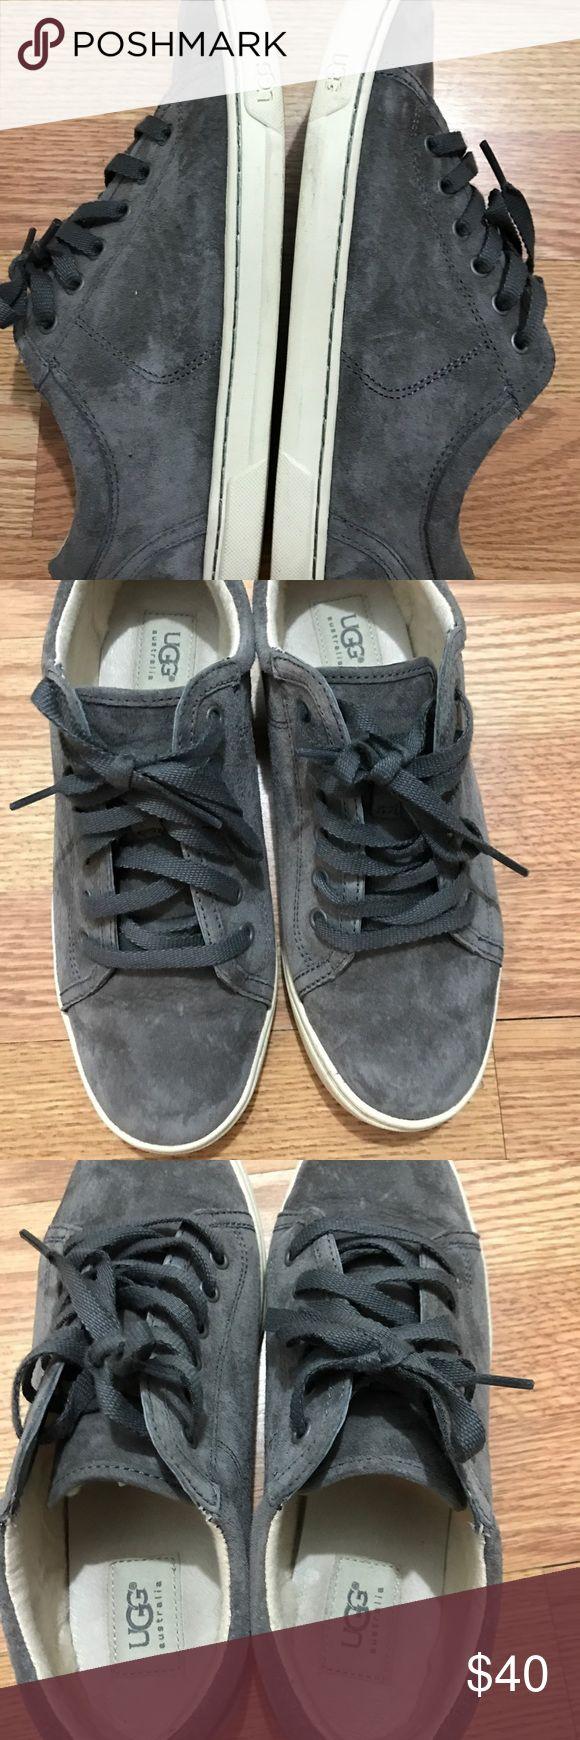 Ugg sneakers Great shade Ugg sneakers. Versatile and cute. Gently worn. Shoes Sneakers